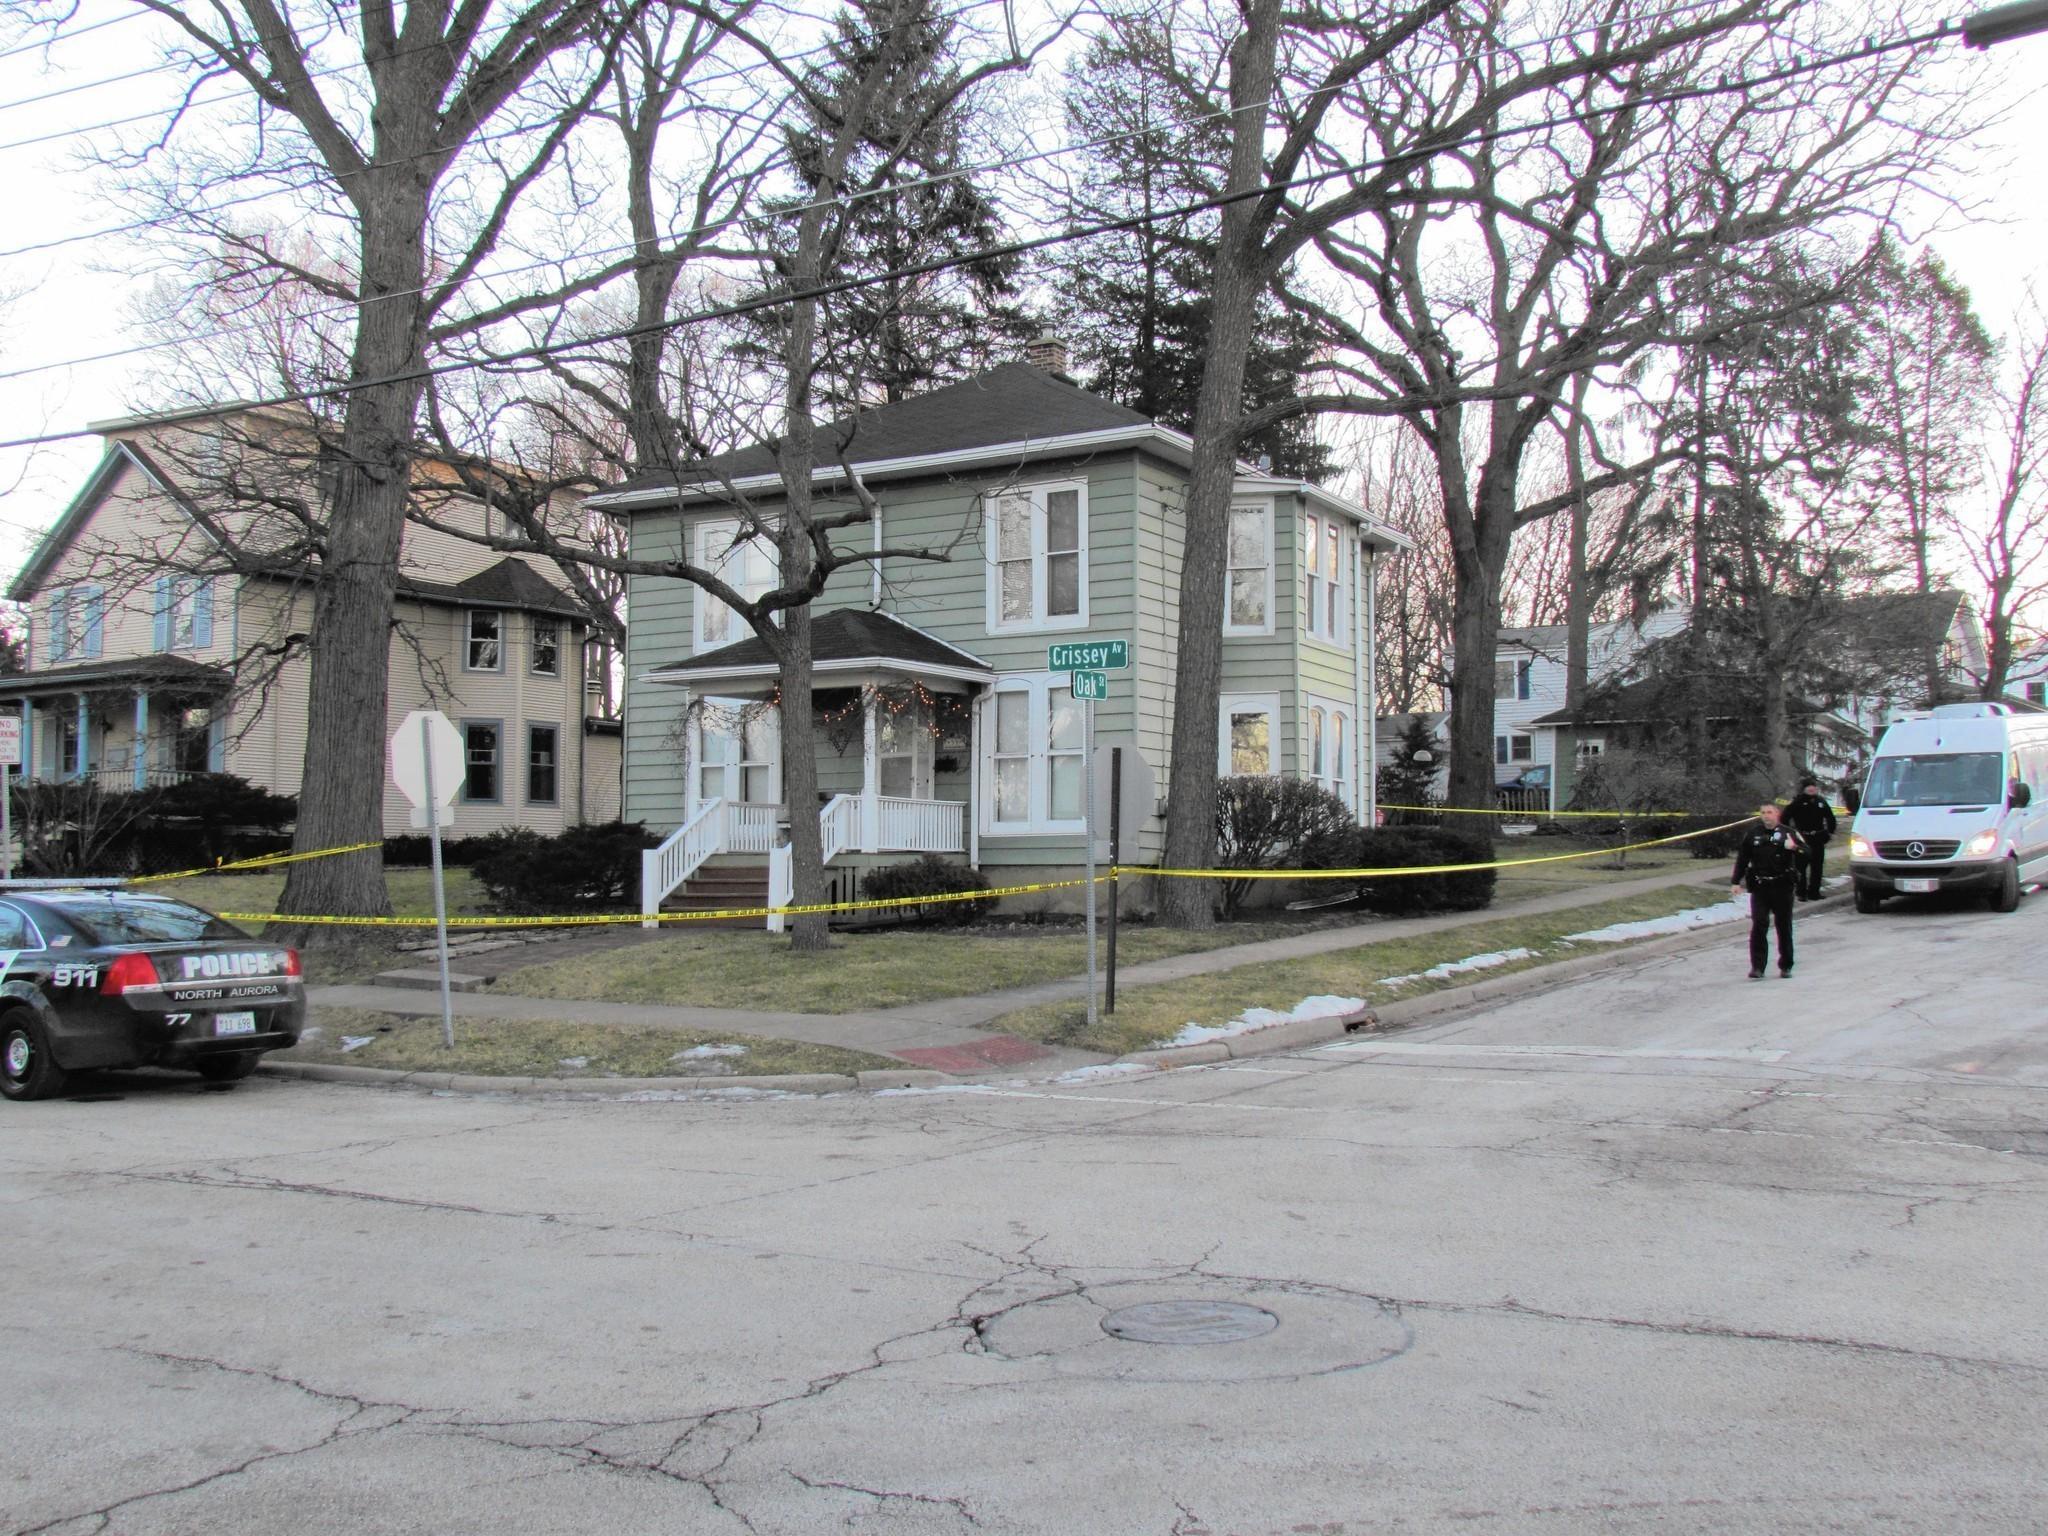 Police investigate after man found dead in Geneva home ...